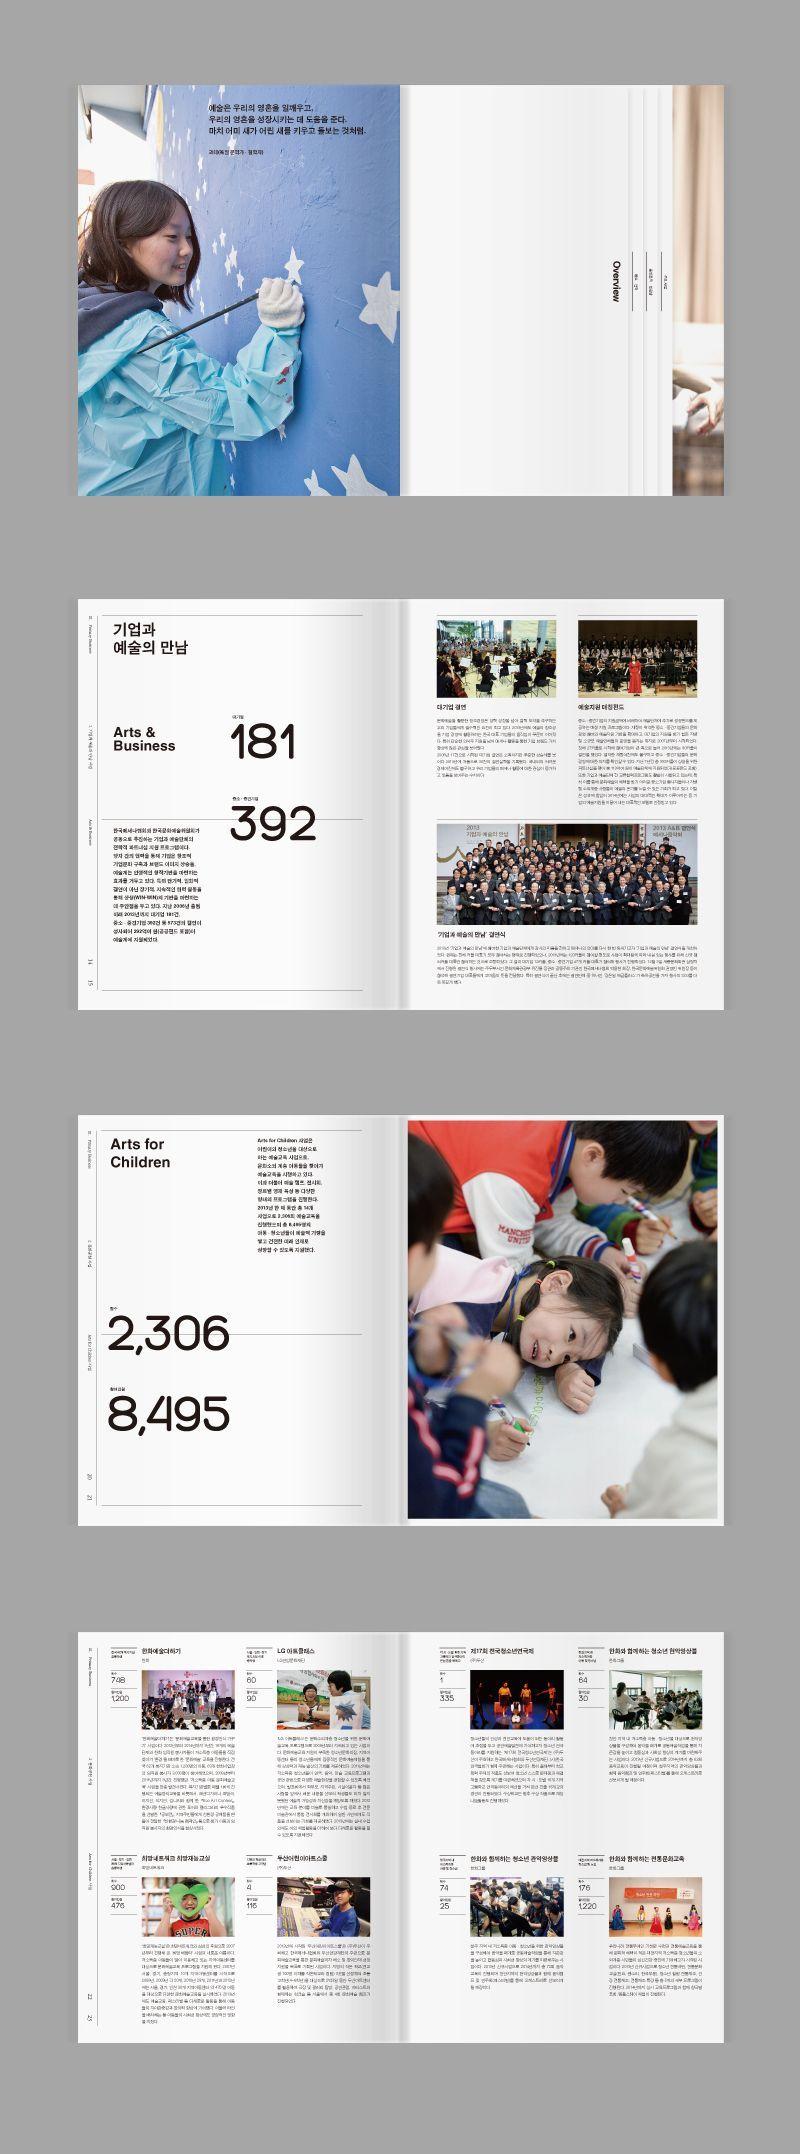 AR #annualreports 한국메세나협회 annual report 내지 디자인 #annualreports